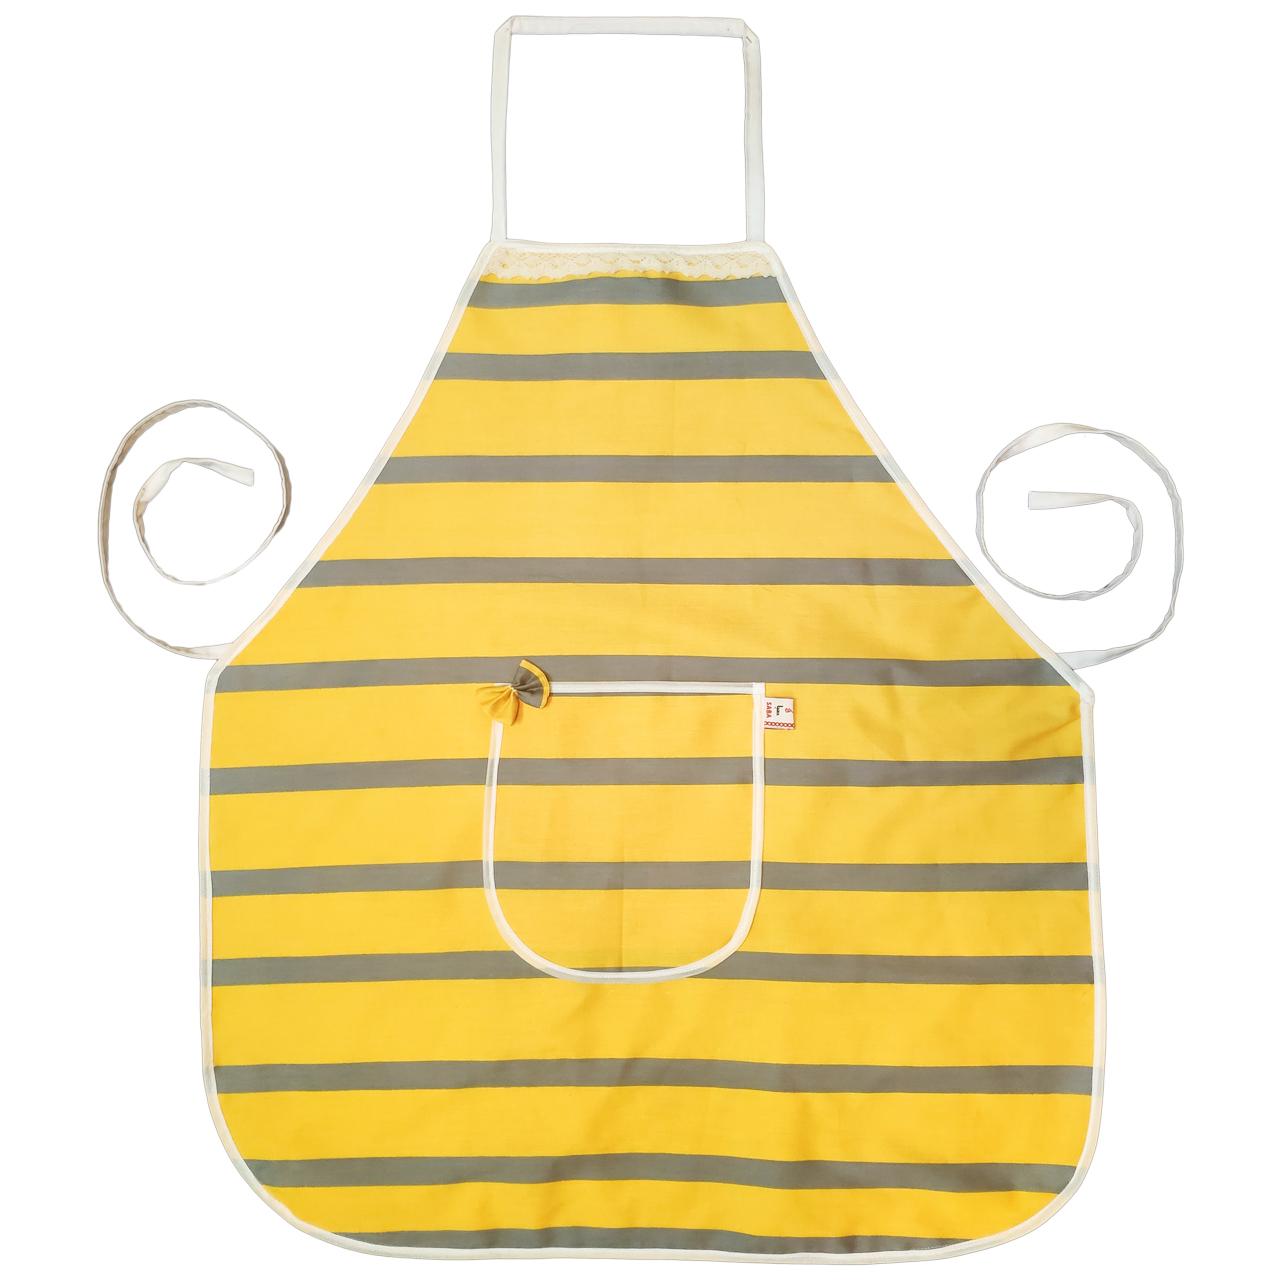 پیش بند آشپزخانه صبا طرح زنبوری کد 94